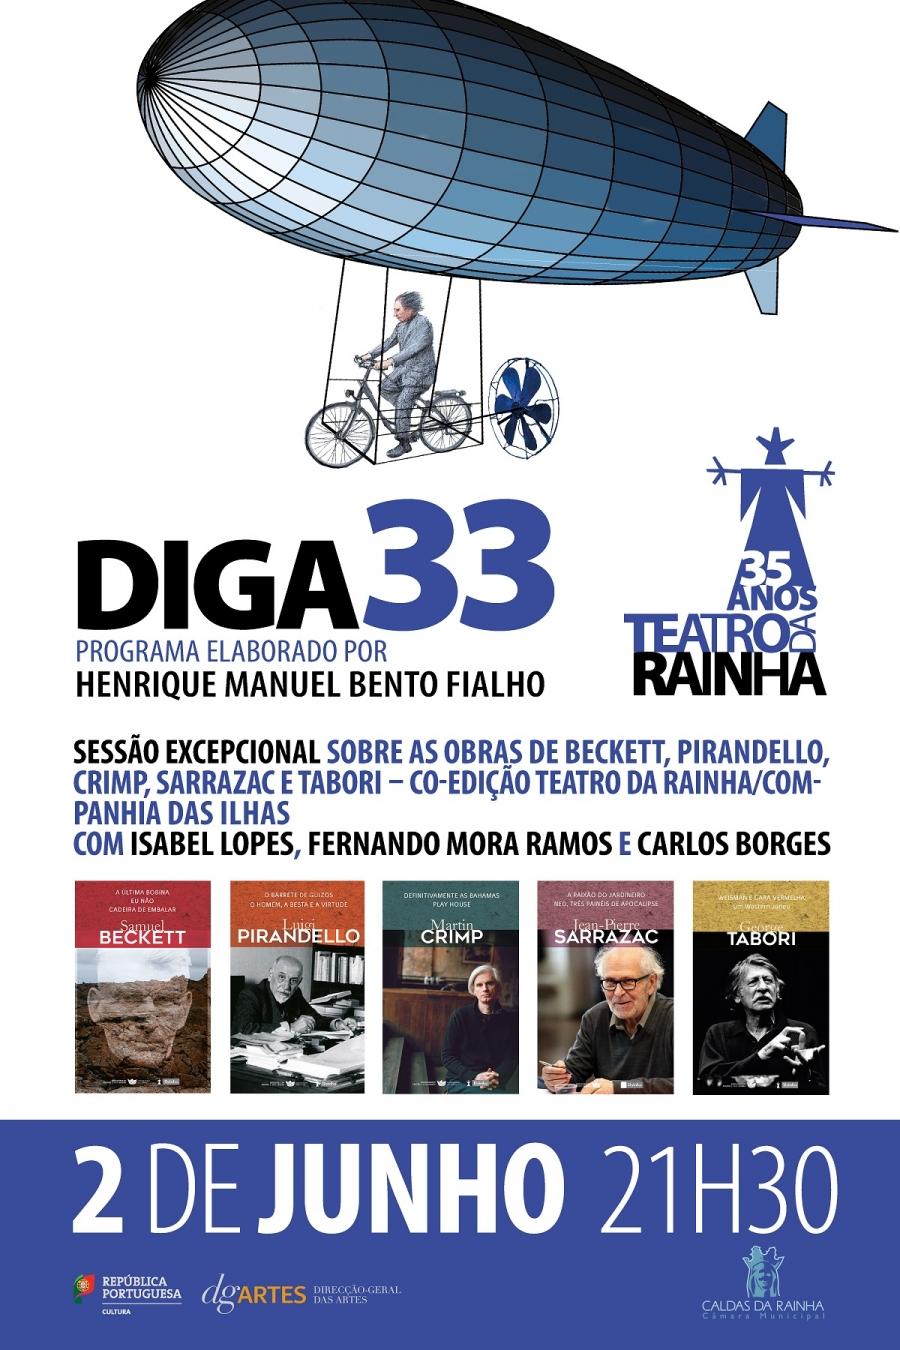 DIGA 33 com Isabel Lopes, Fernando Mora Ramos e Carlos Borges